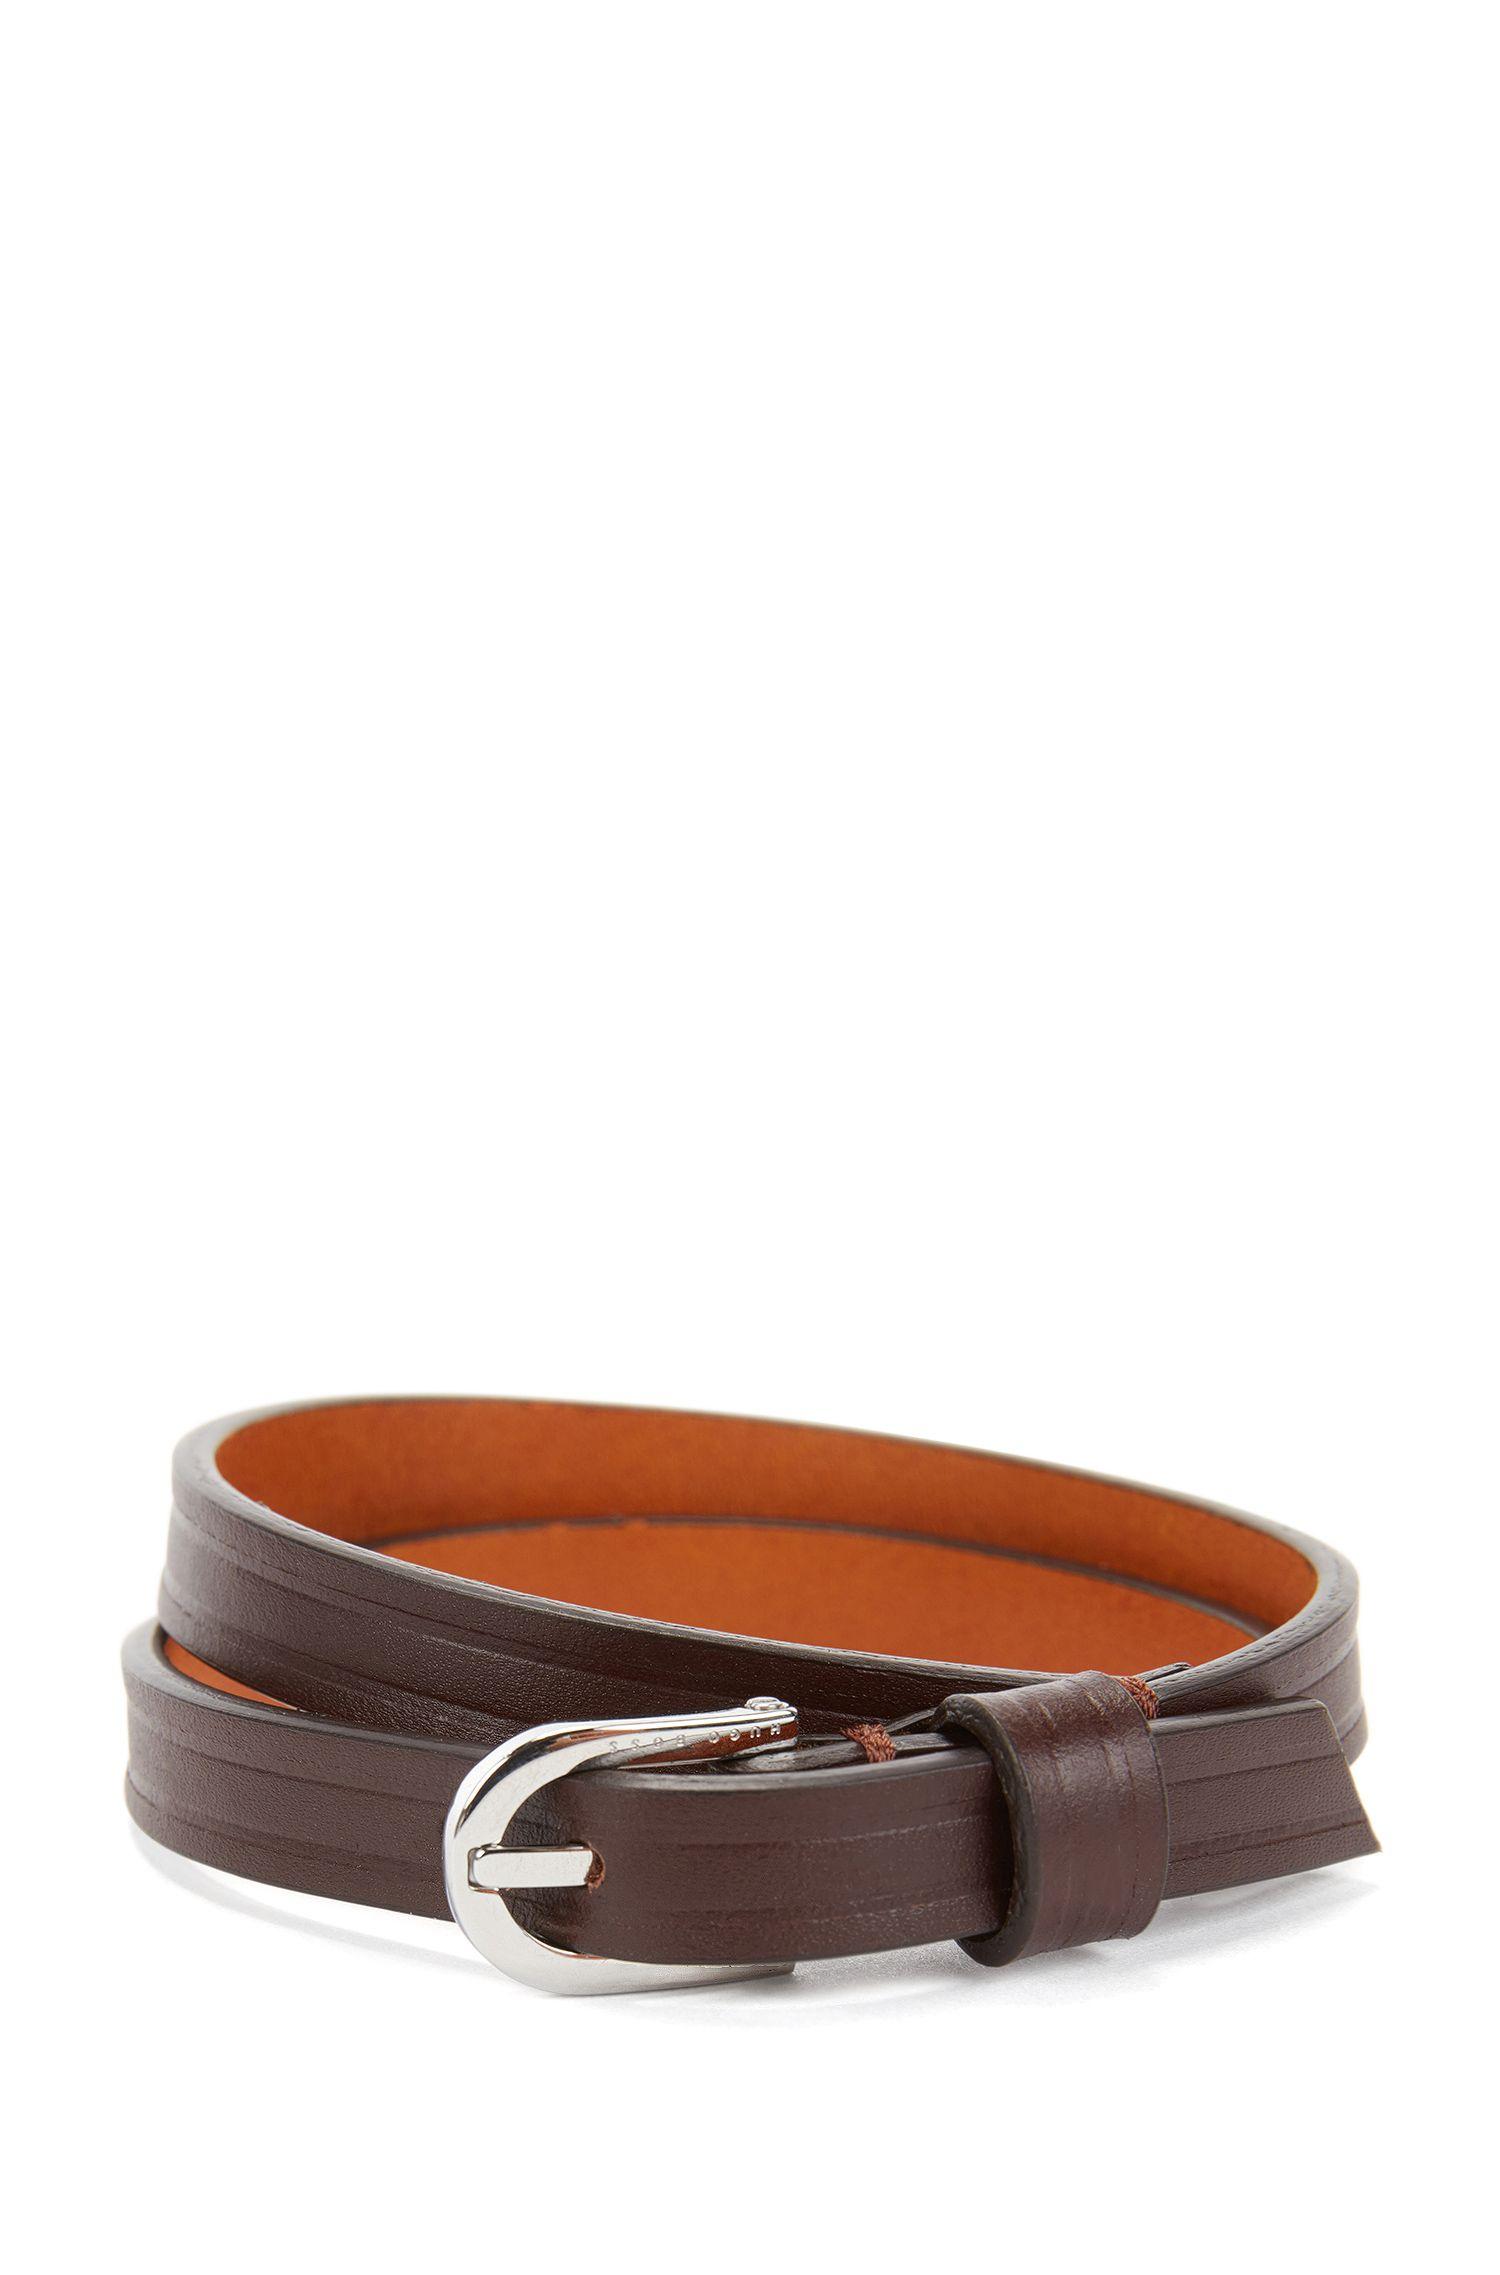 Double Wrap Leather Bracelet | Bello